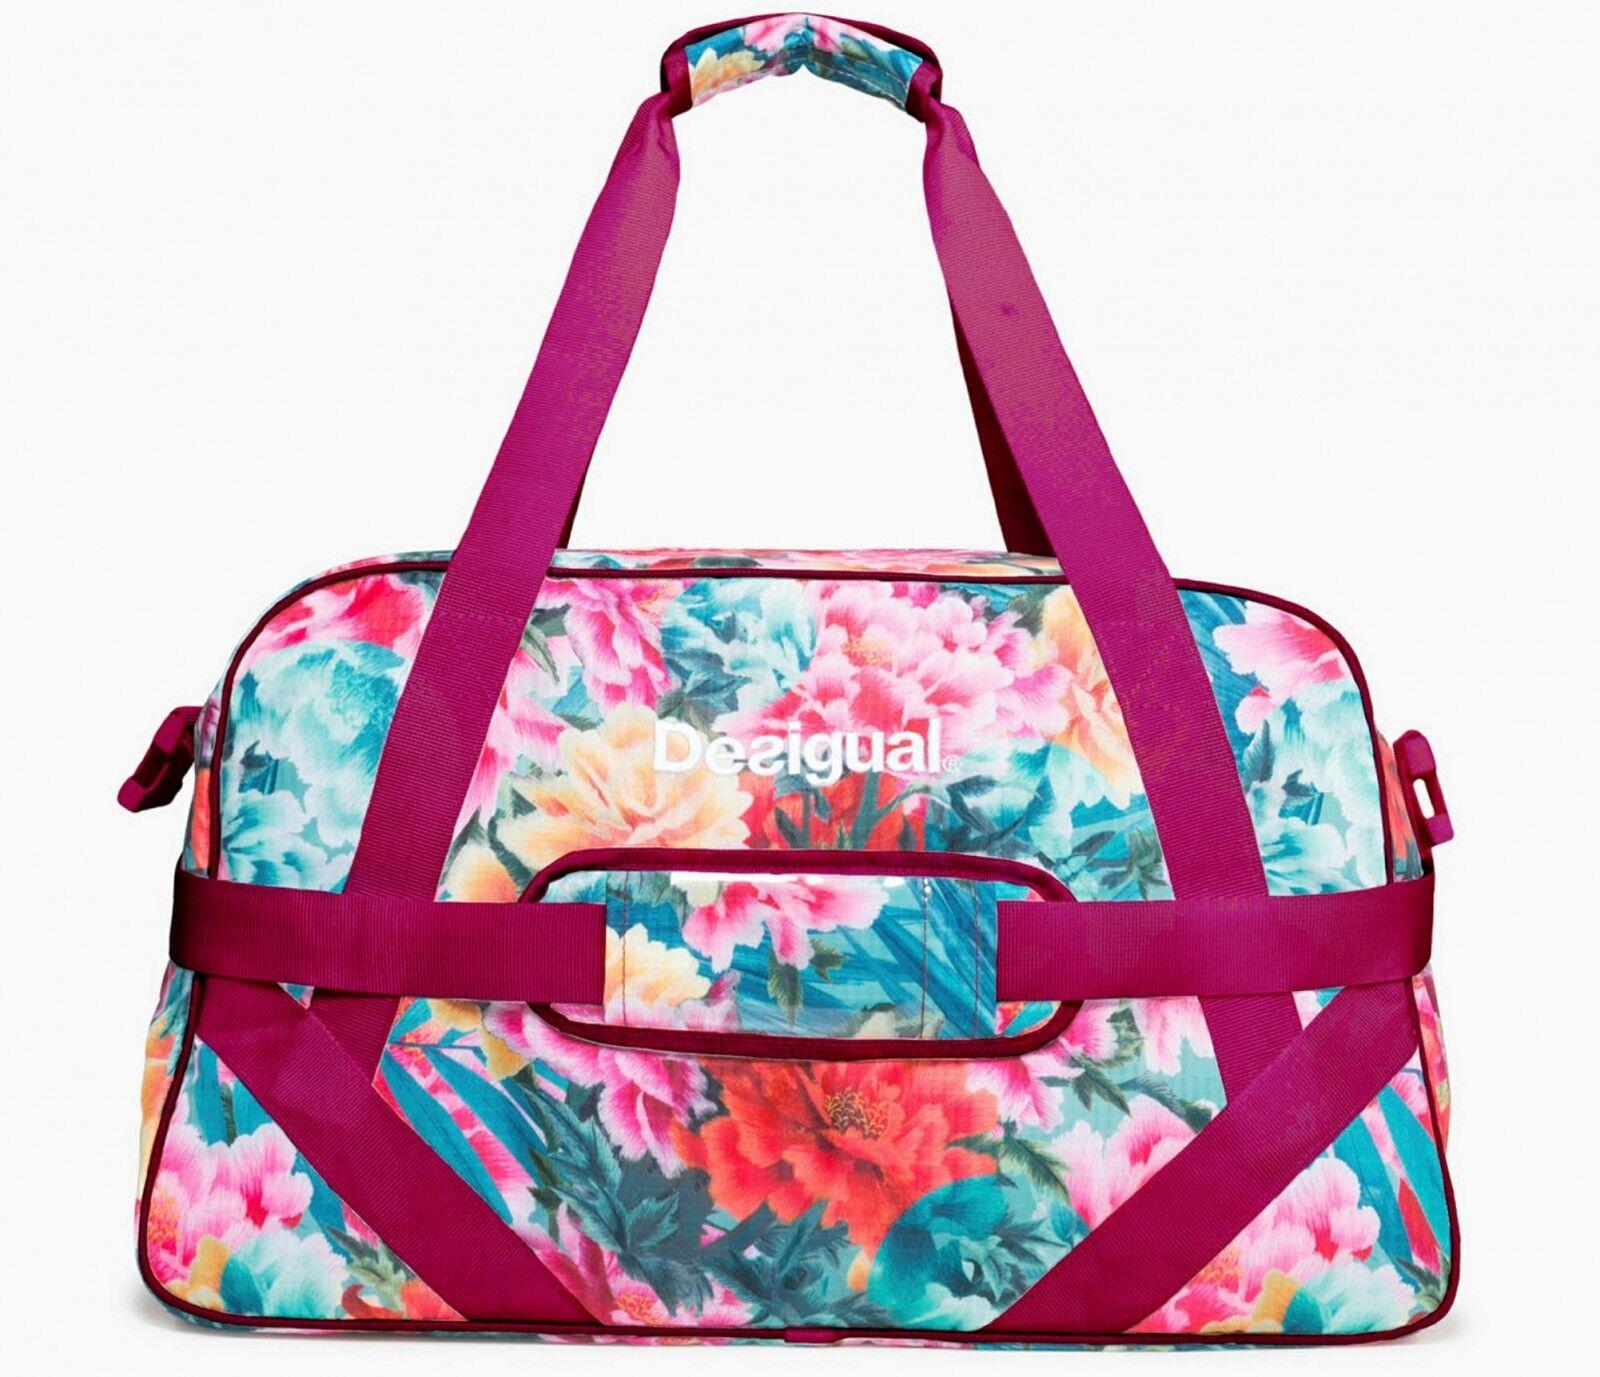 Desigual Tropic Carry Carry Tropic Shoulder Bag Sporttasche Umhängetasche Schultertasche 3bf24b